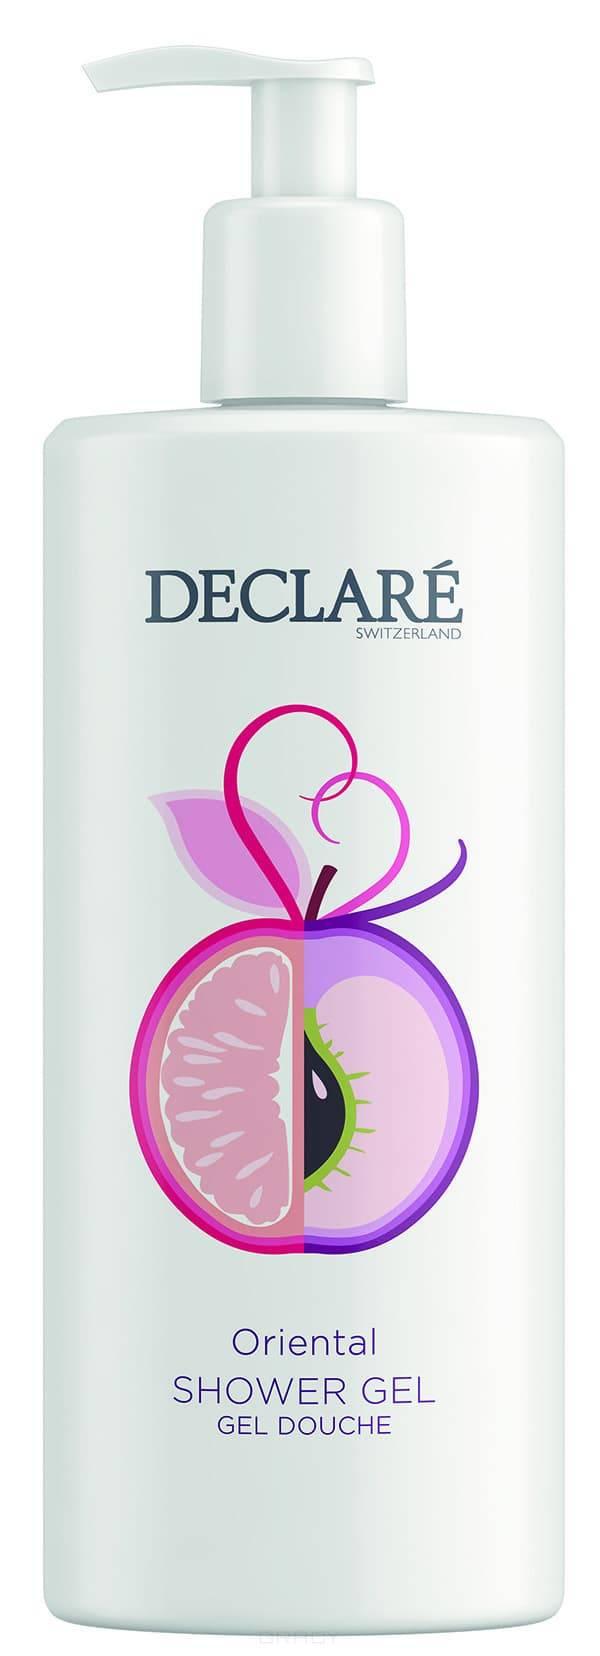 Declare, Гель для душа Восток Oriental Shower Gel, 390 мл гель для душа dr sea shower gel